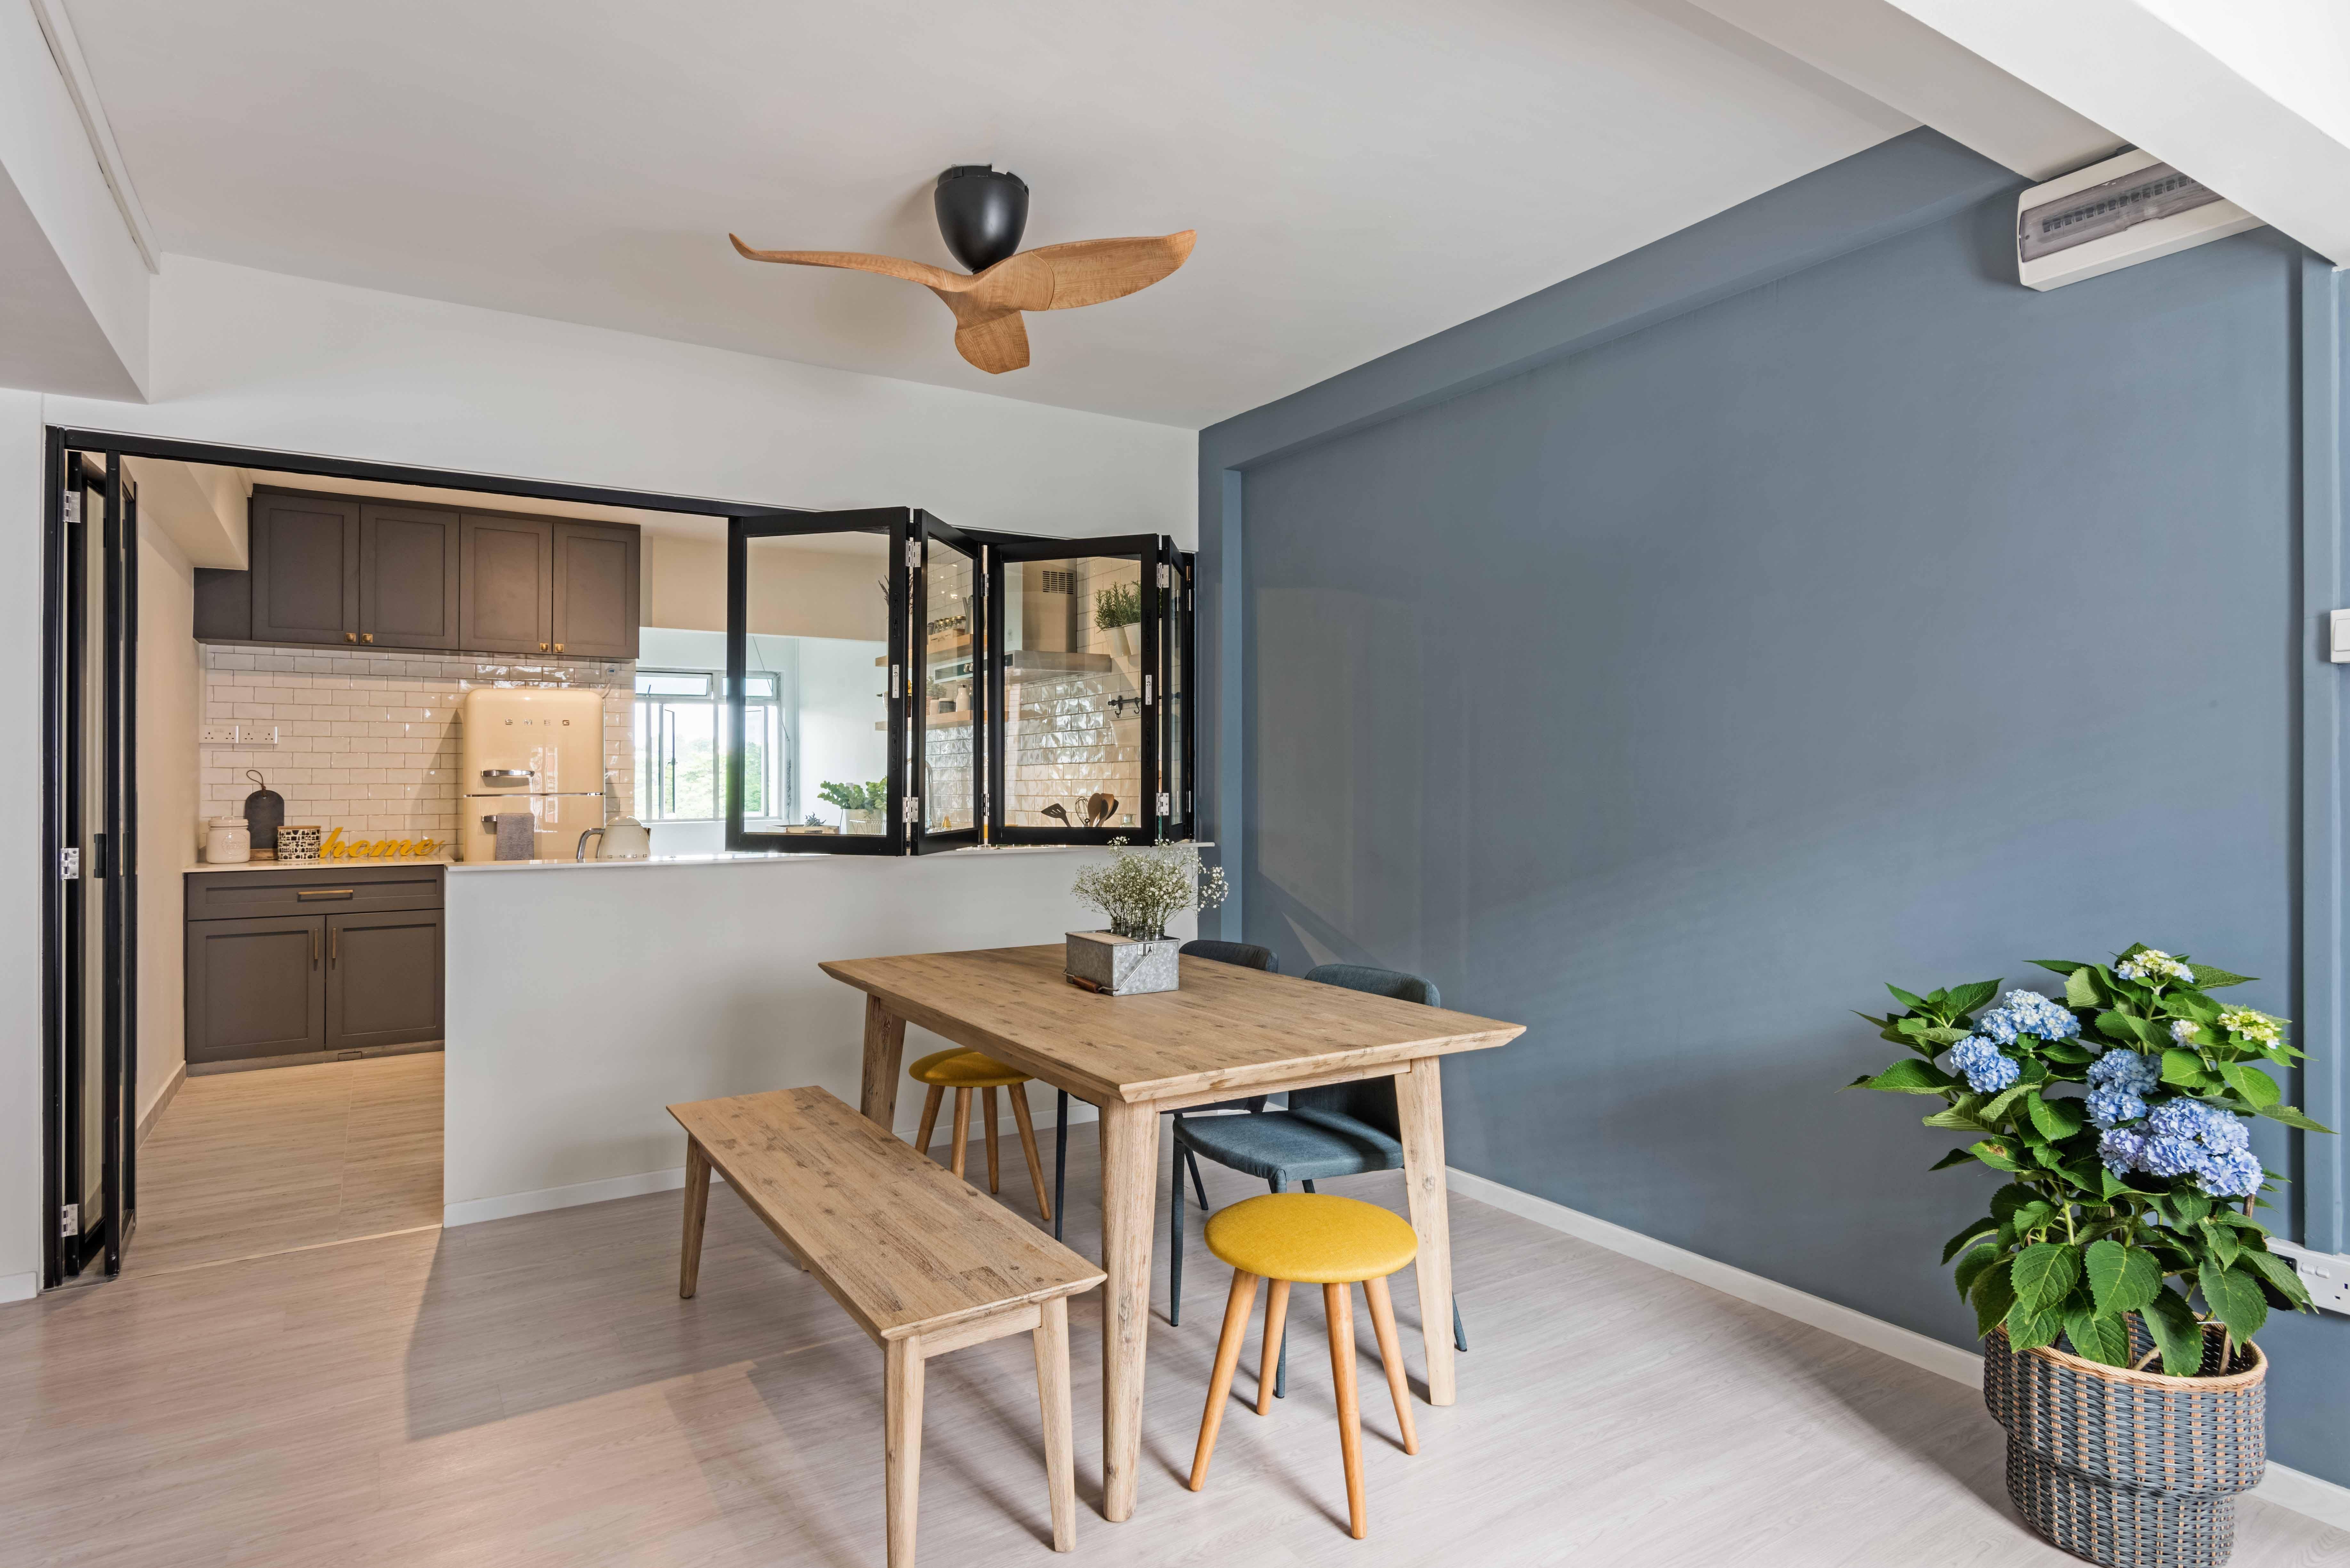 Designing Your Open-Concept Kitchen - DB Studio